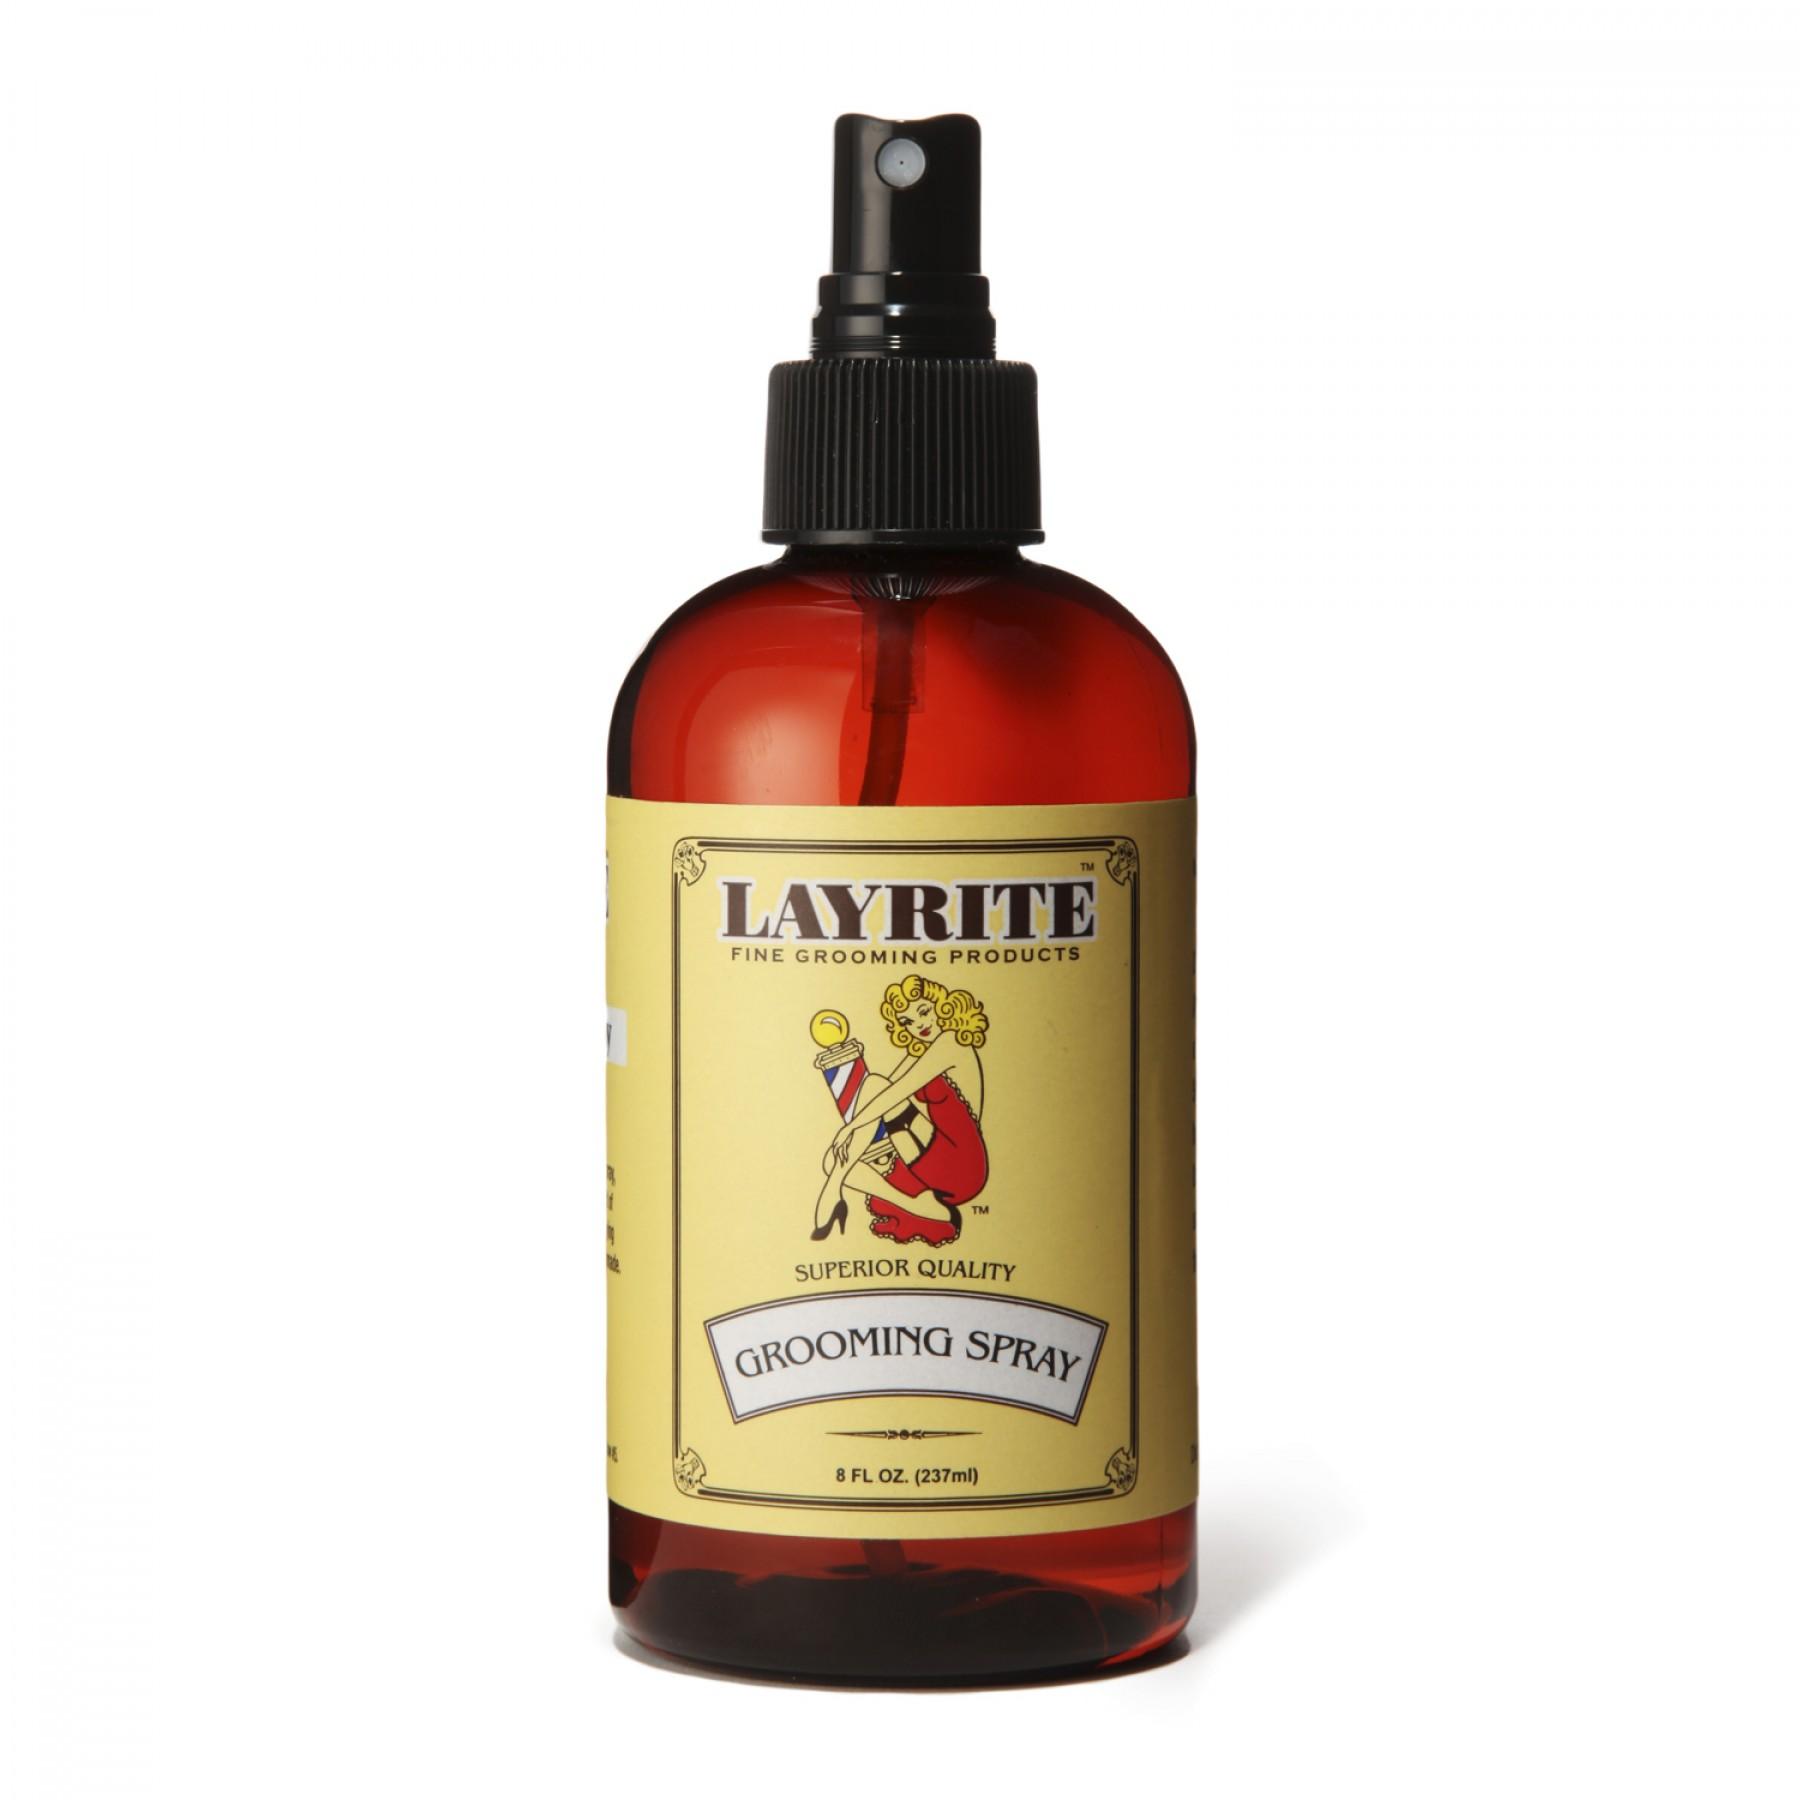 LayriteGroomingSpray